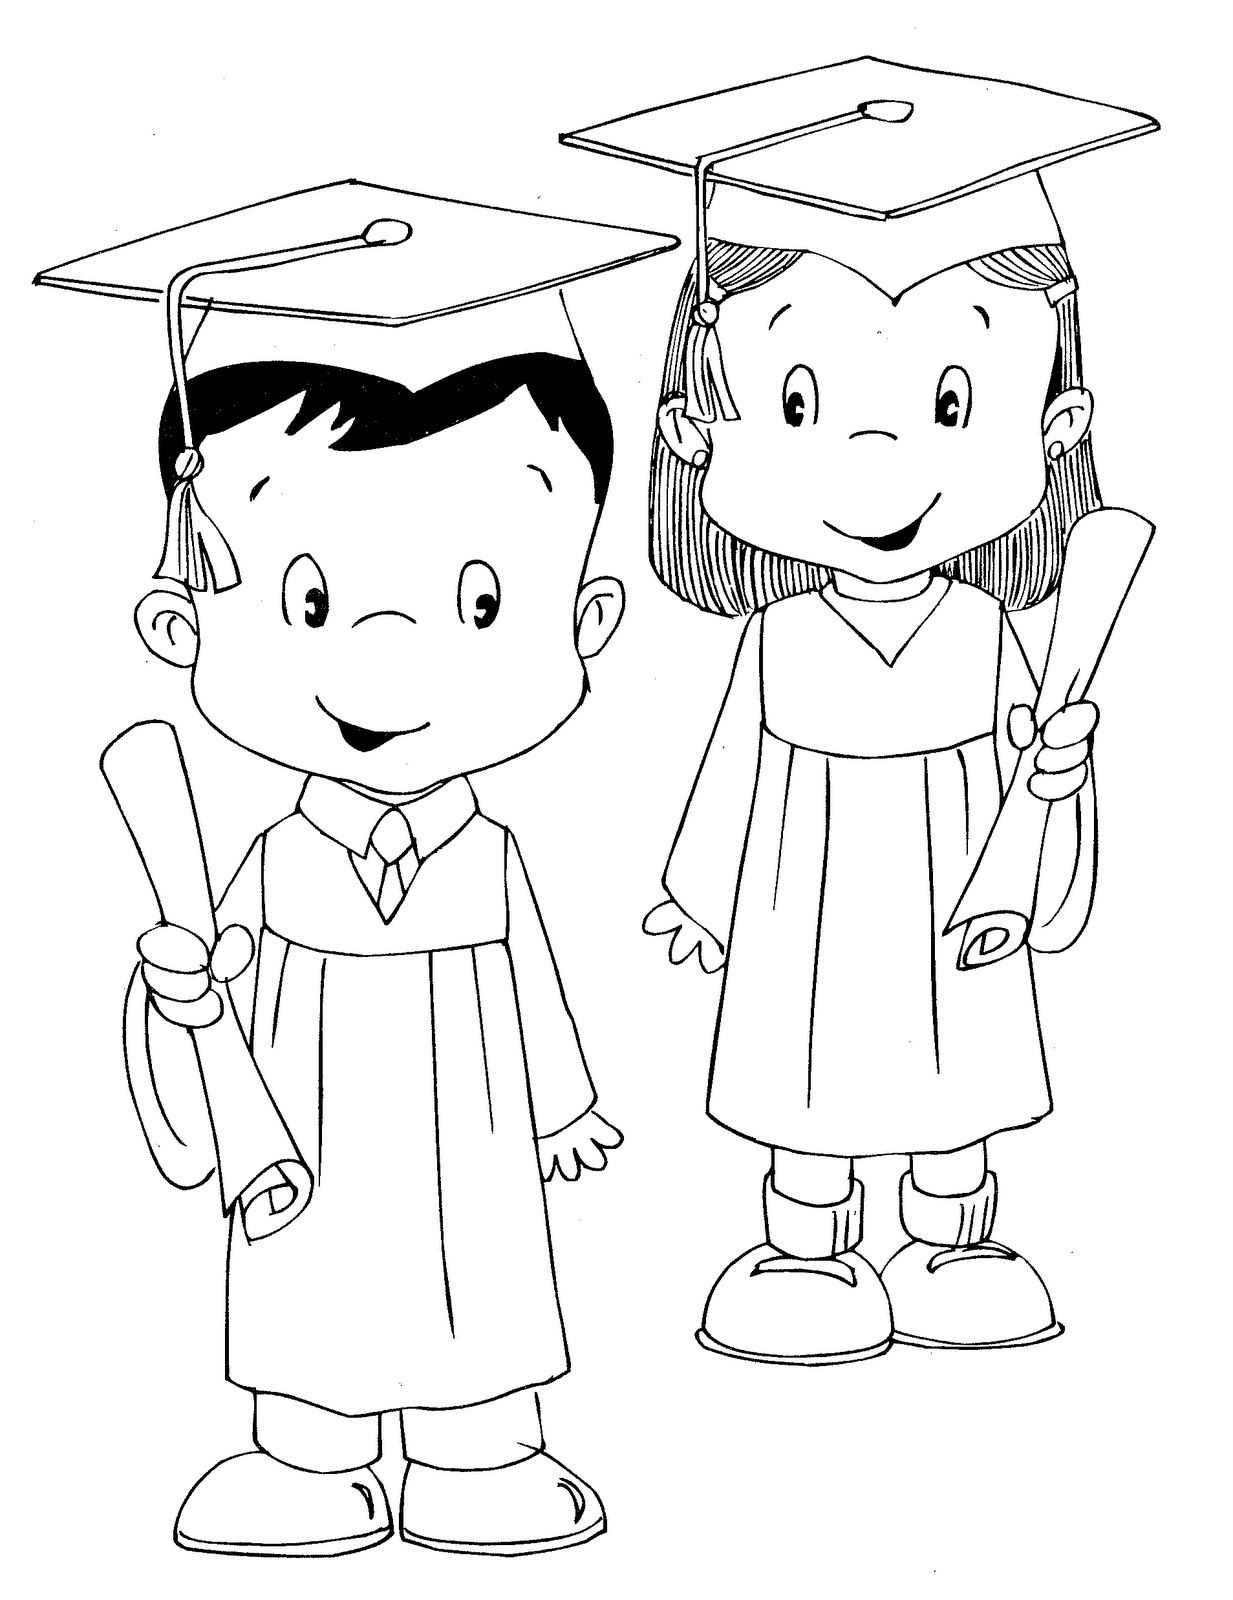 Dibujo De Graduacion Para Colorear